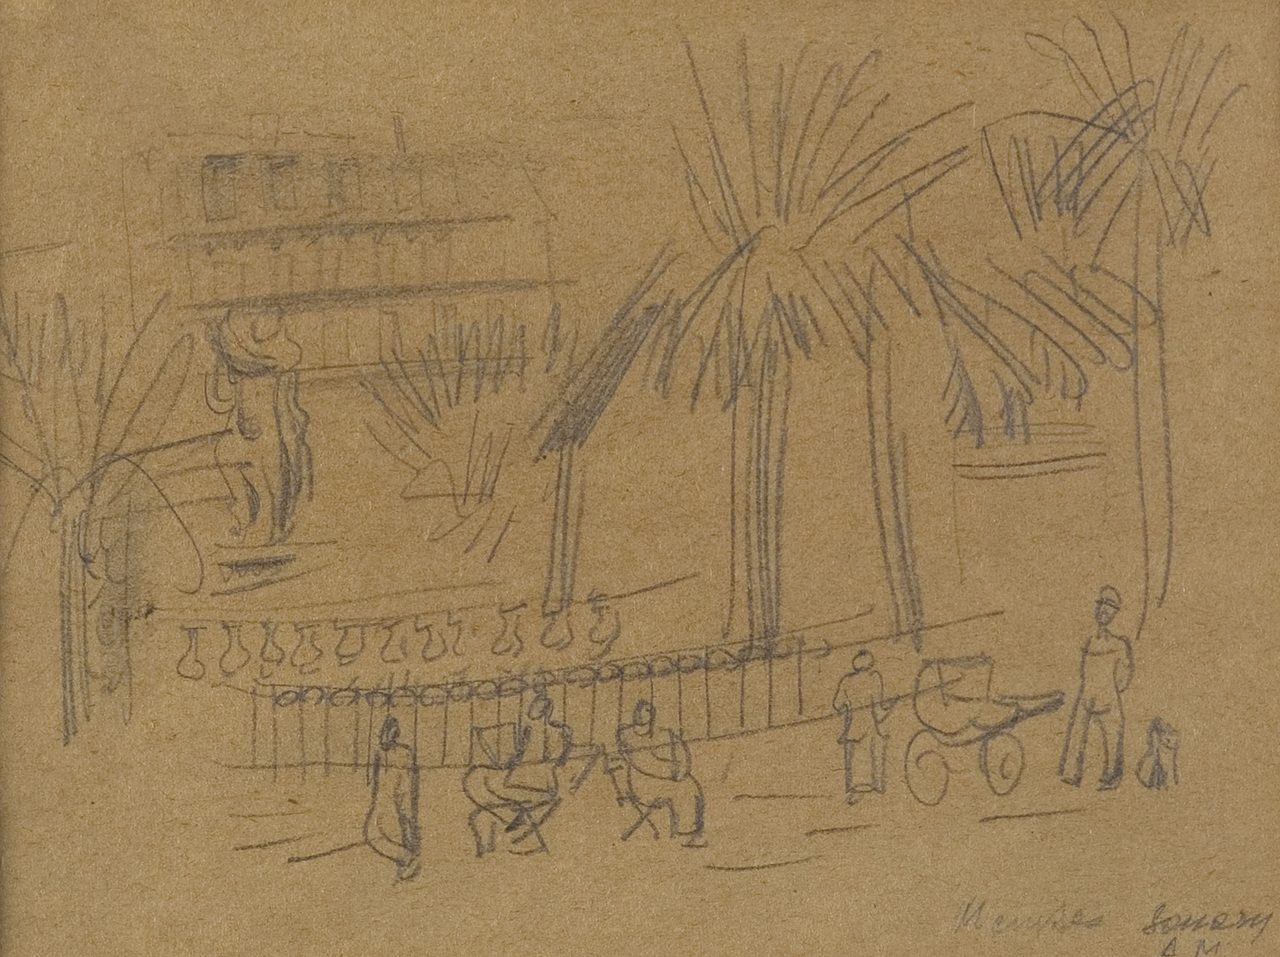 Ulicy w Sanary sur Mer, ok 1925 r.